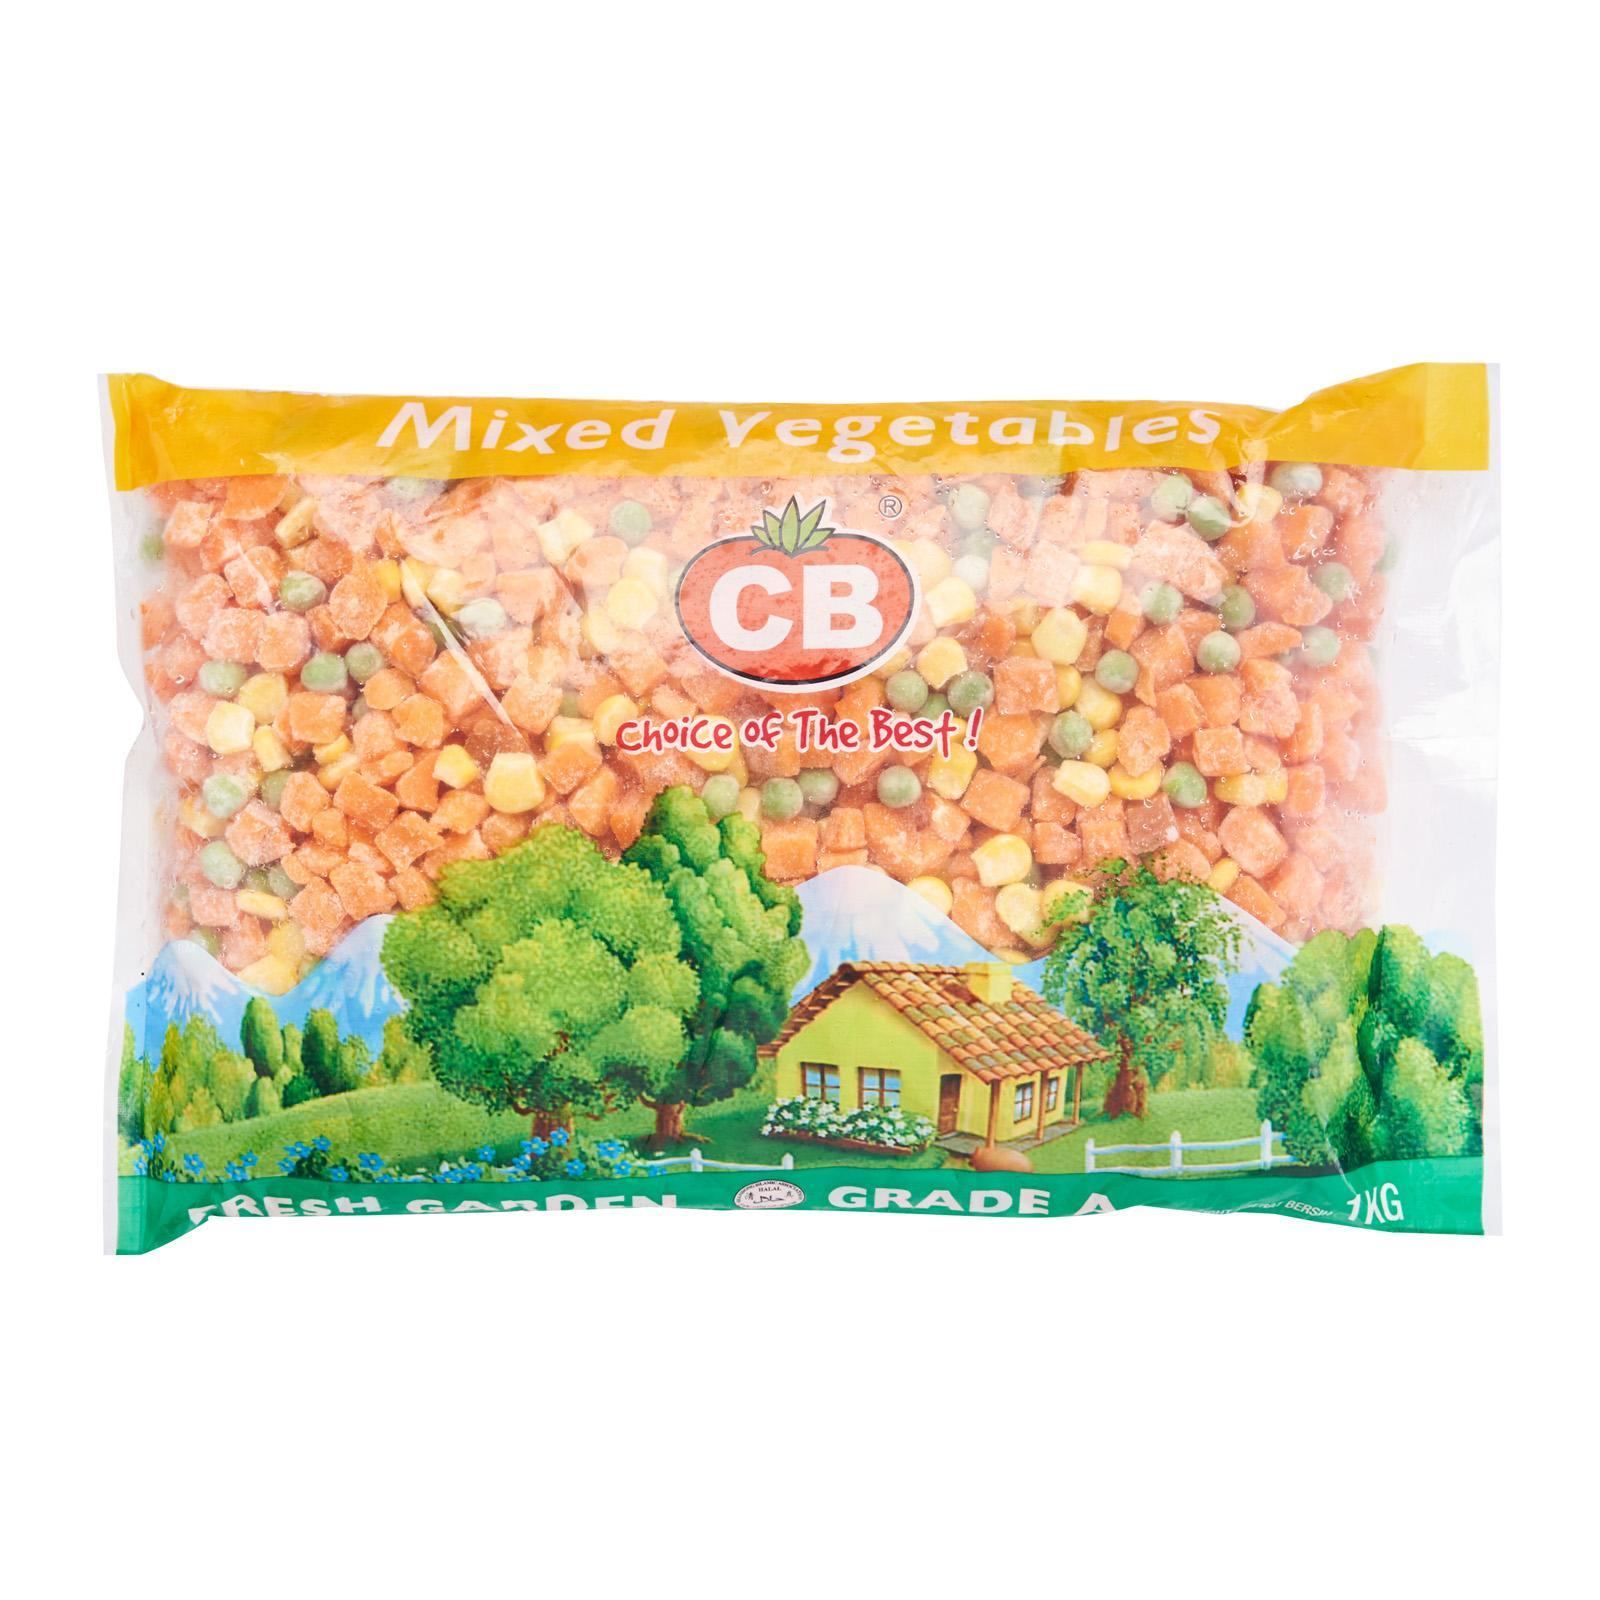 Cb Mixed Vegetables - Frozen By Redmart.